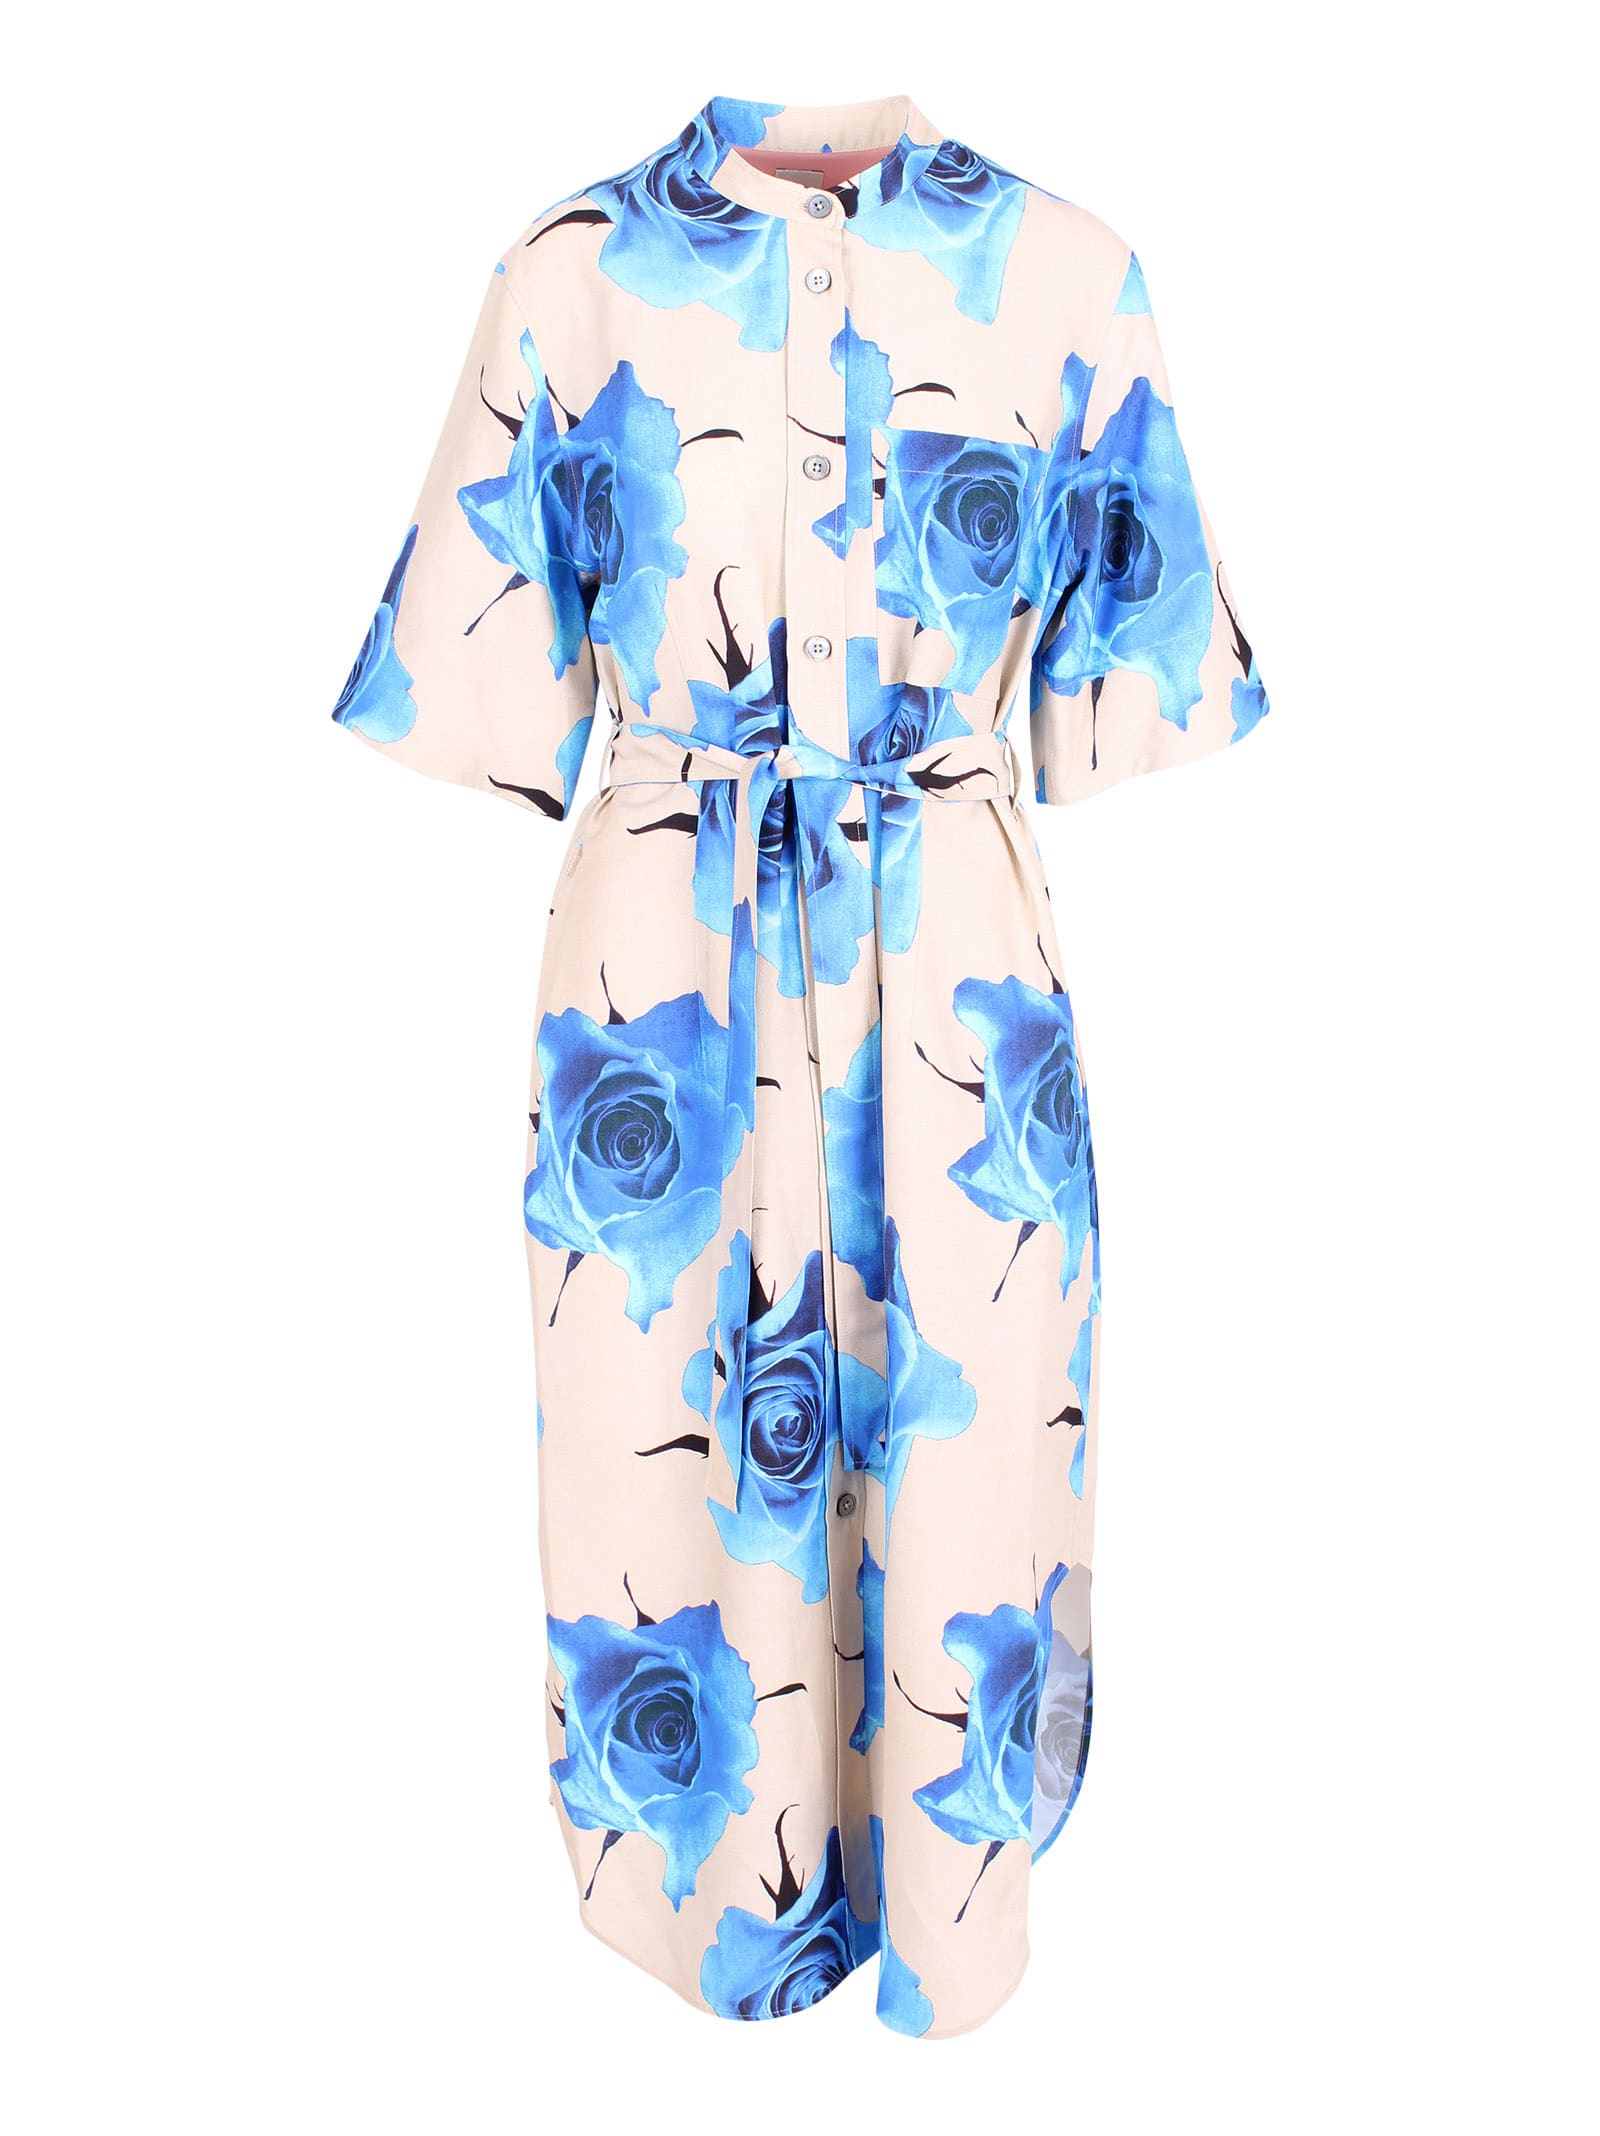 Paul Smith VISCOSE DRESS